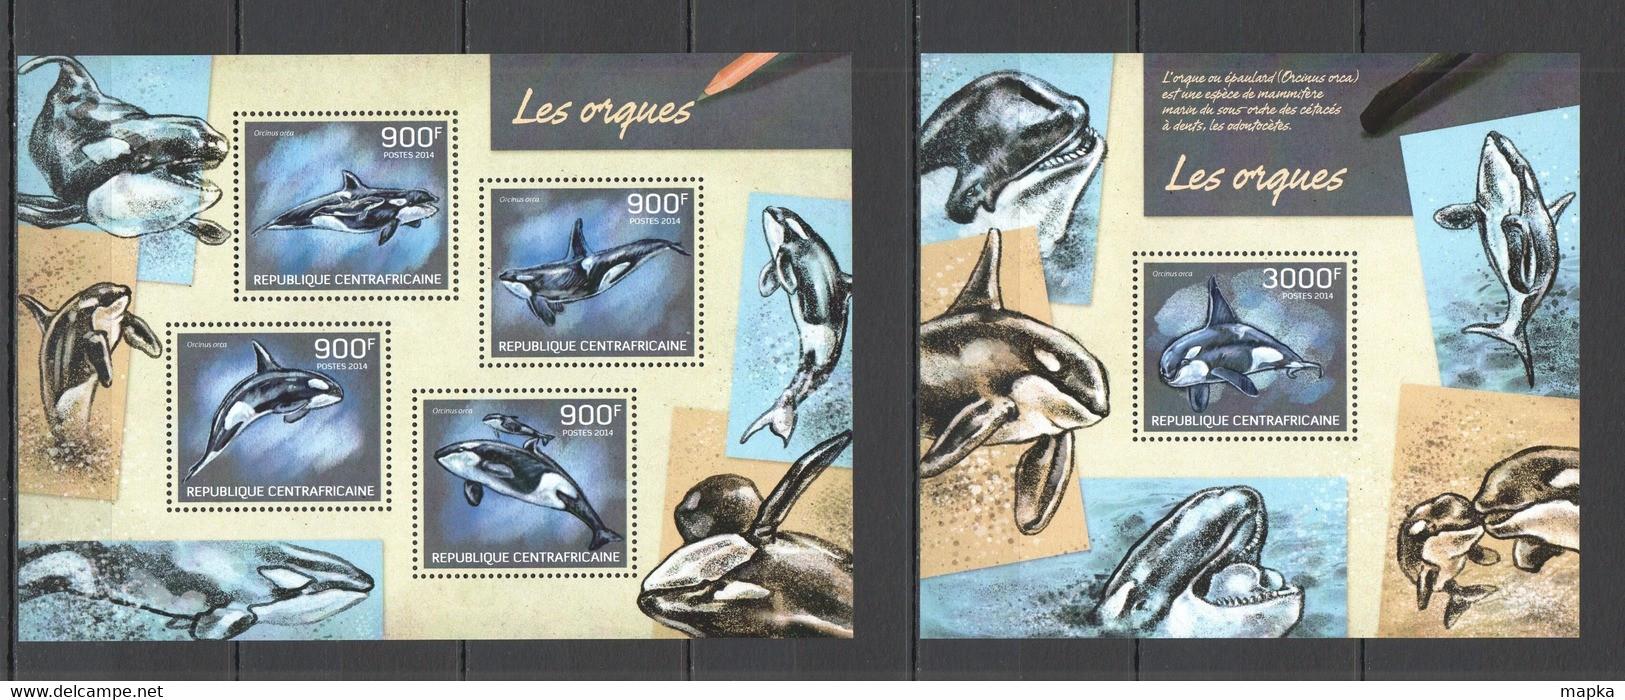 CA431 2014 CENTRAL AFRICA CENTRAFRICAINE FAUNA MARINE LIFE ORCAS LES ORQUES KB+BL MNH - Ballenas